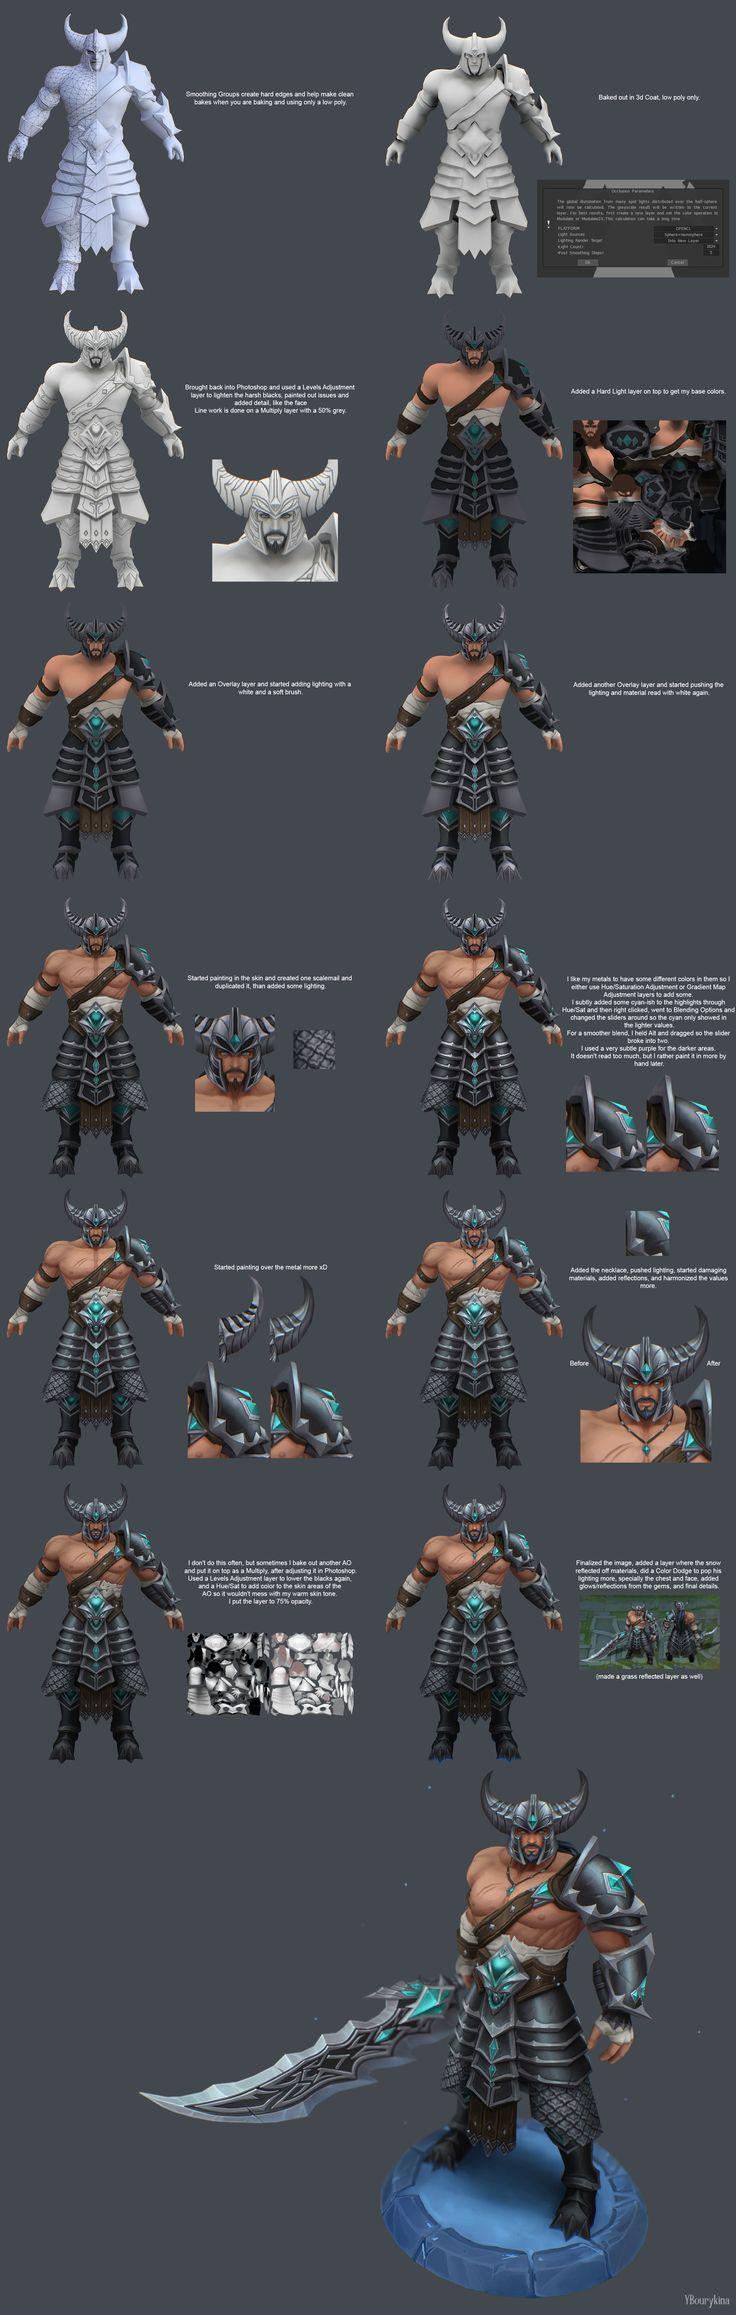 Tryndamere Texture Process by YBourykina on DeviantArt